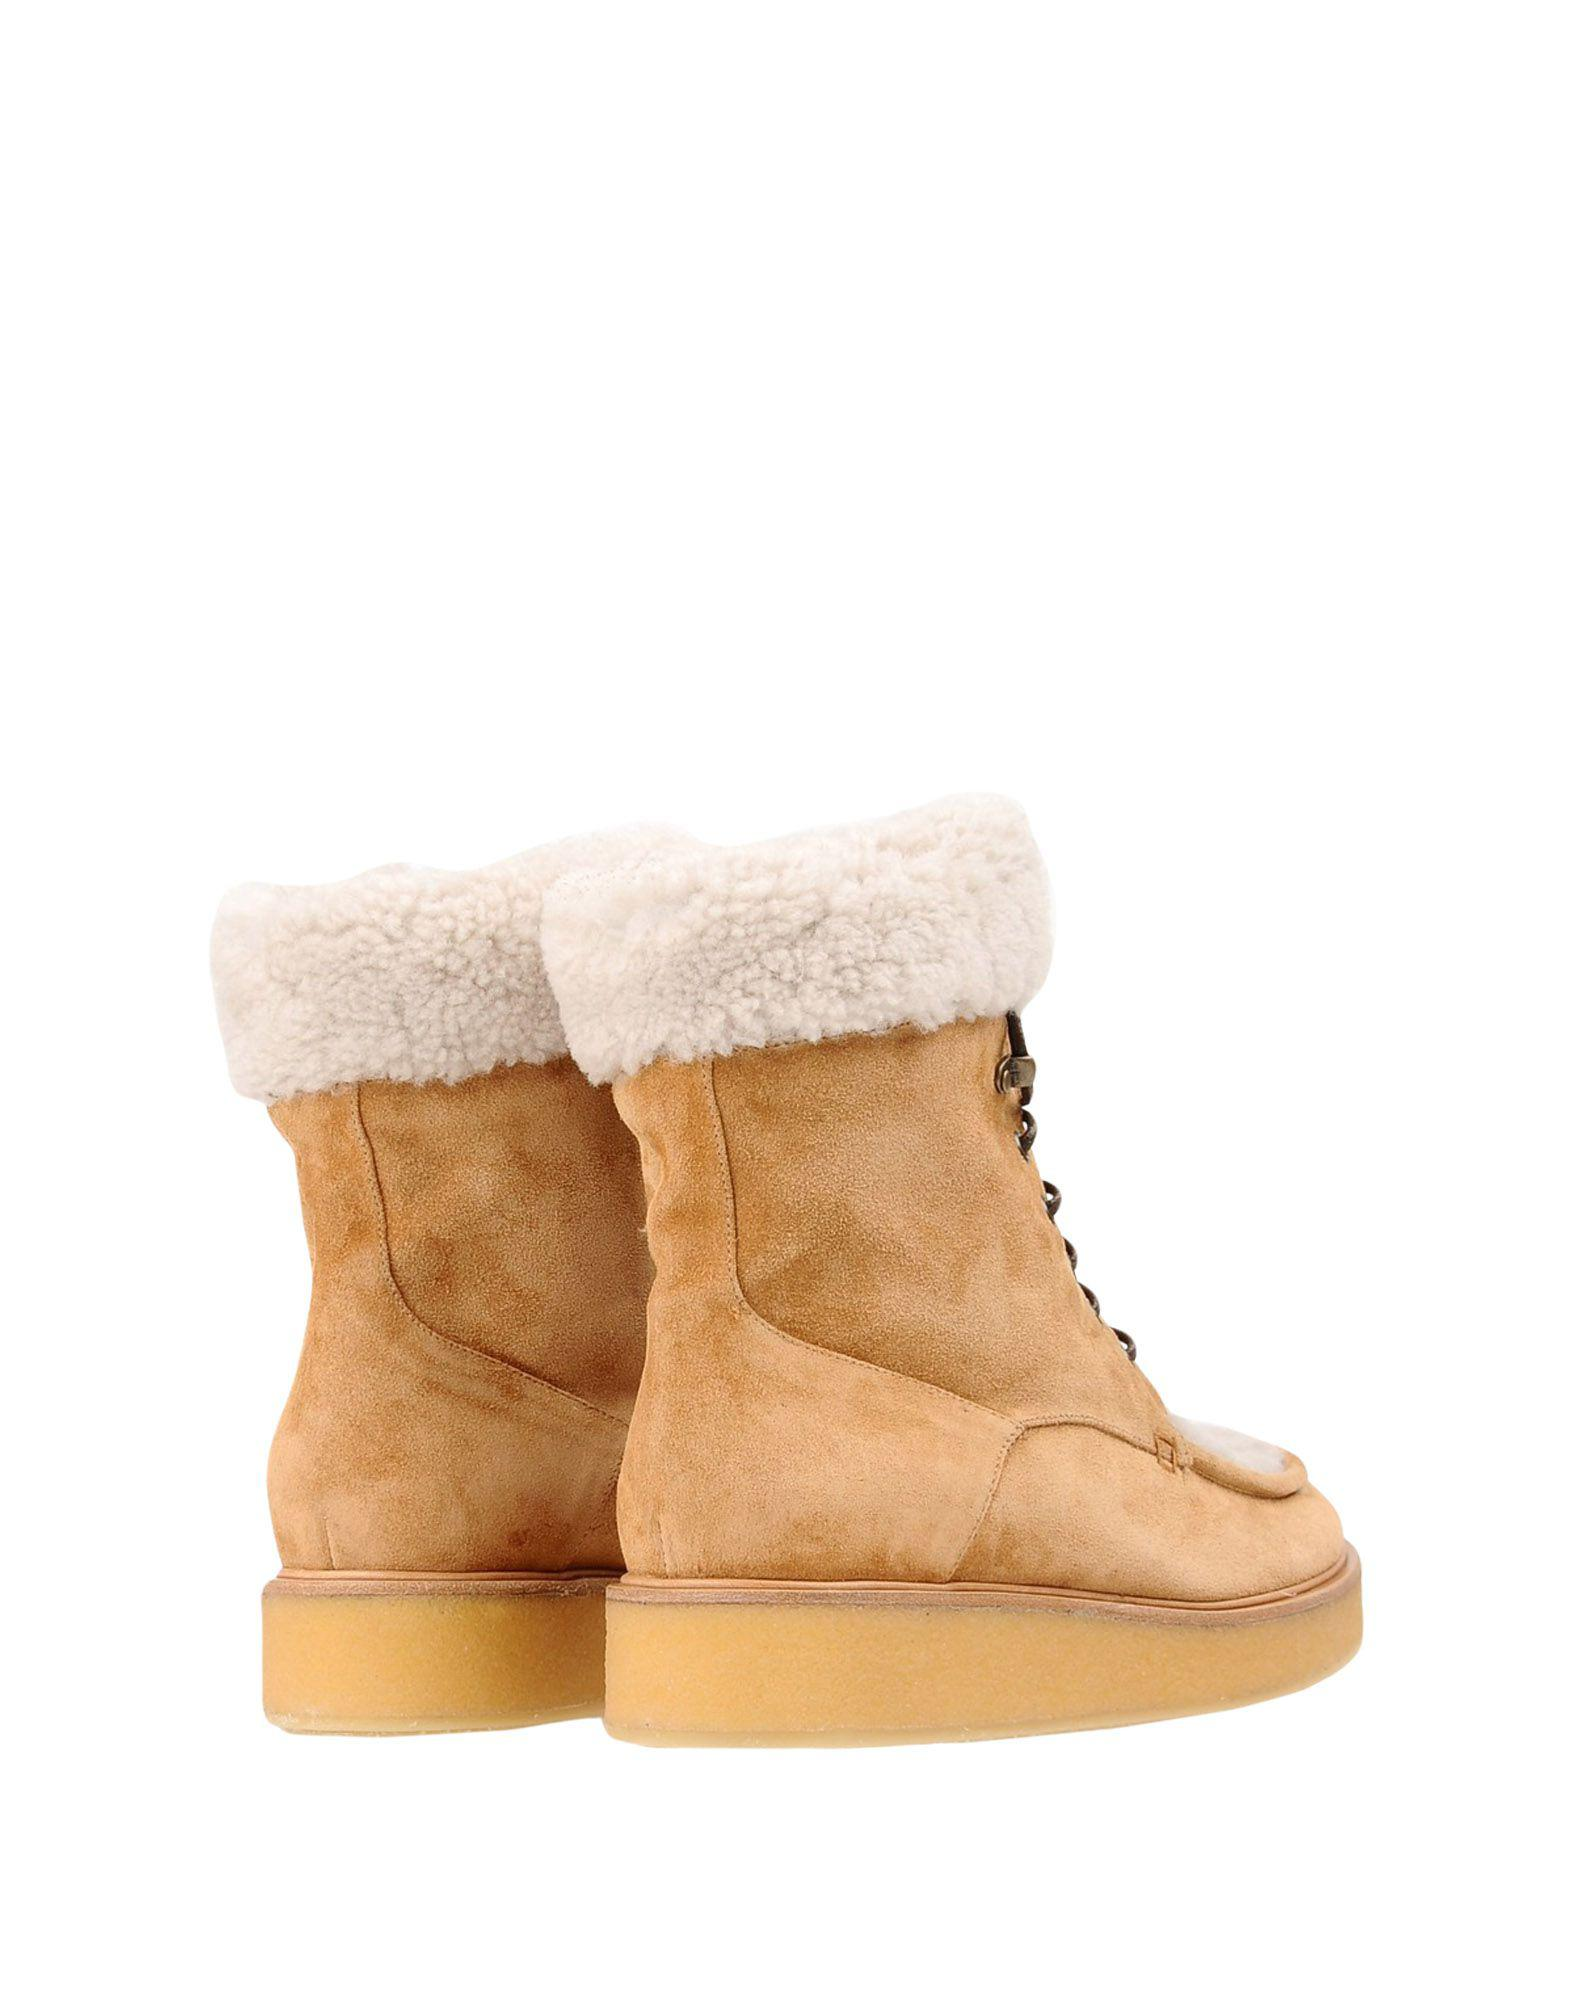 Alberto Fermani Ankle Boots in Tan (Brown)